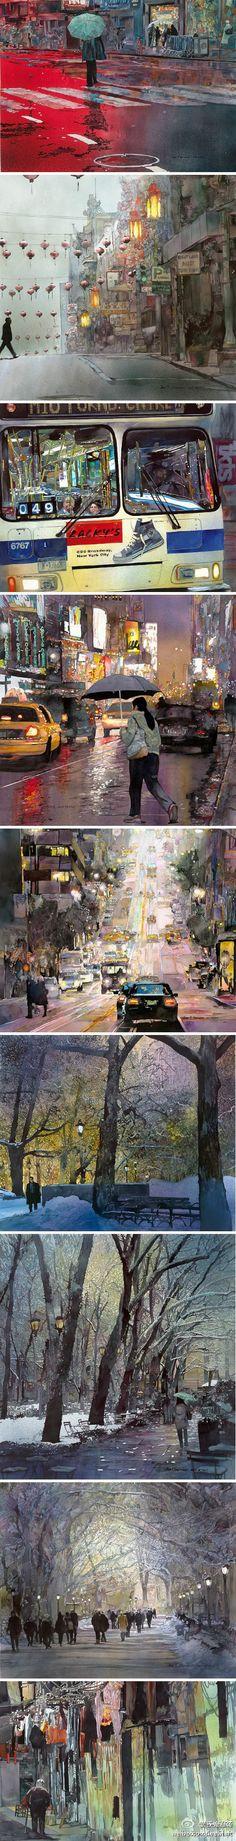 beautiful work by John Salminen